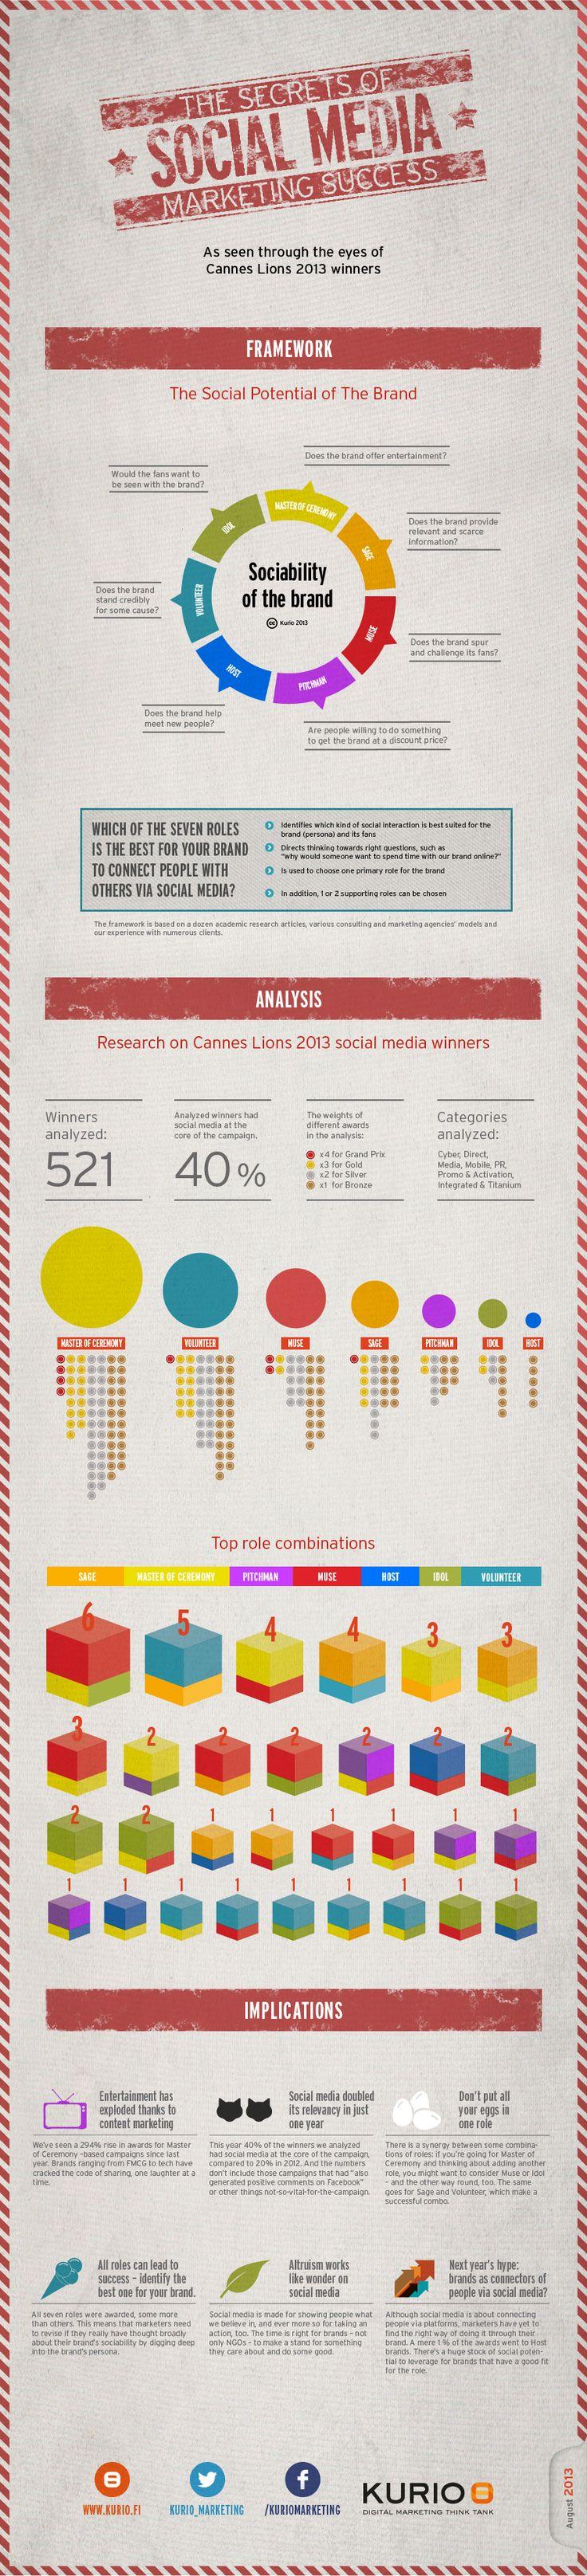 The Secrets Of Social Media Marketing Success #infographic